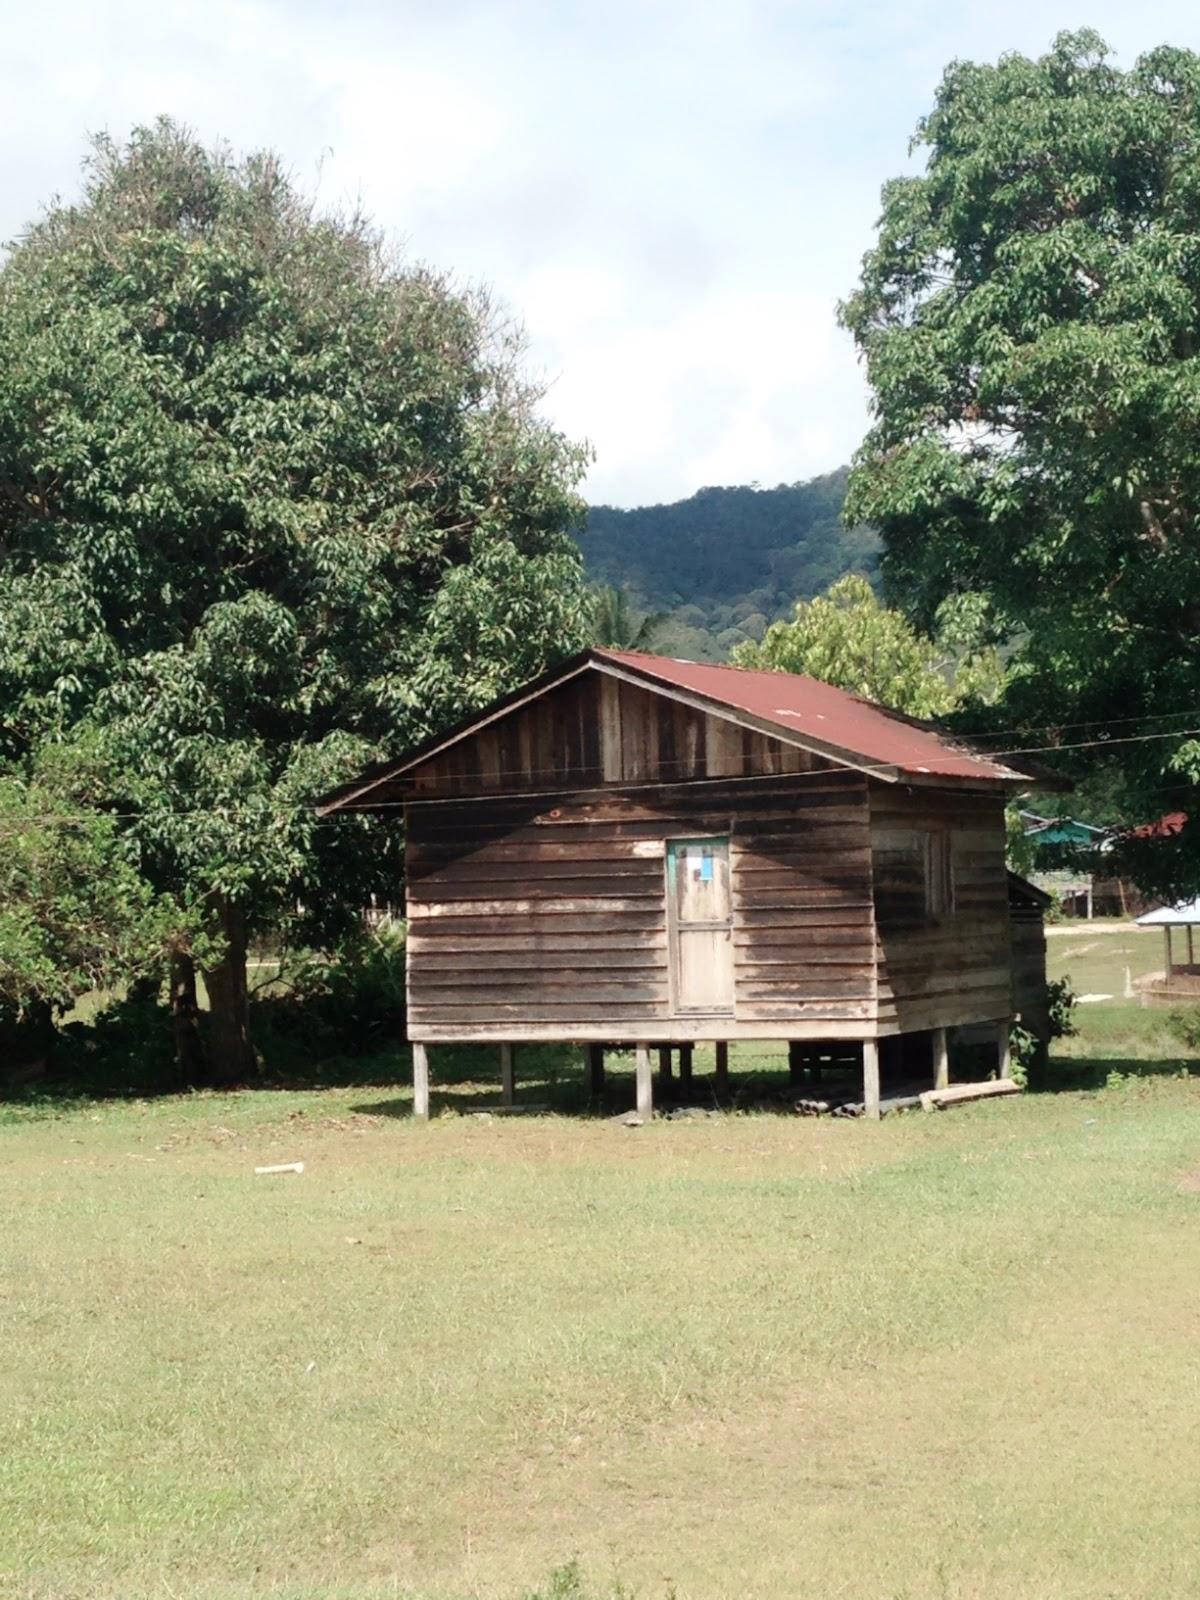 Dokumentasi Kunjungan Lapangan Kegiatan Kampung Sejahtera Long Rumah Penduduk Bawan